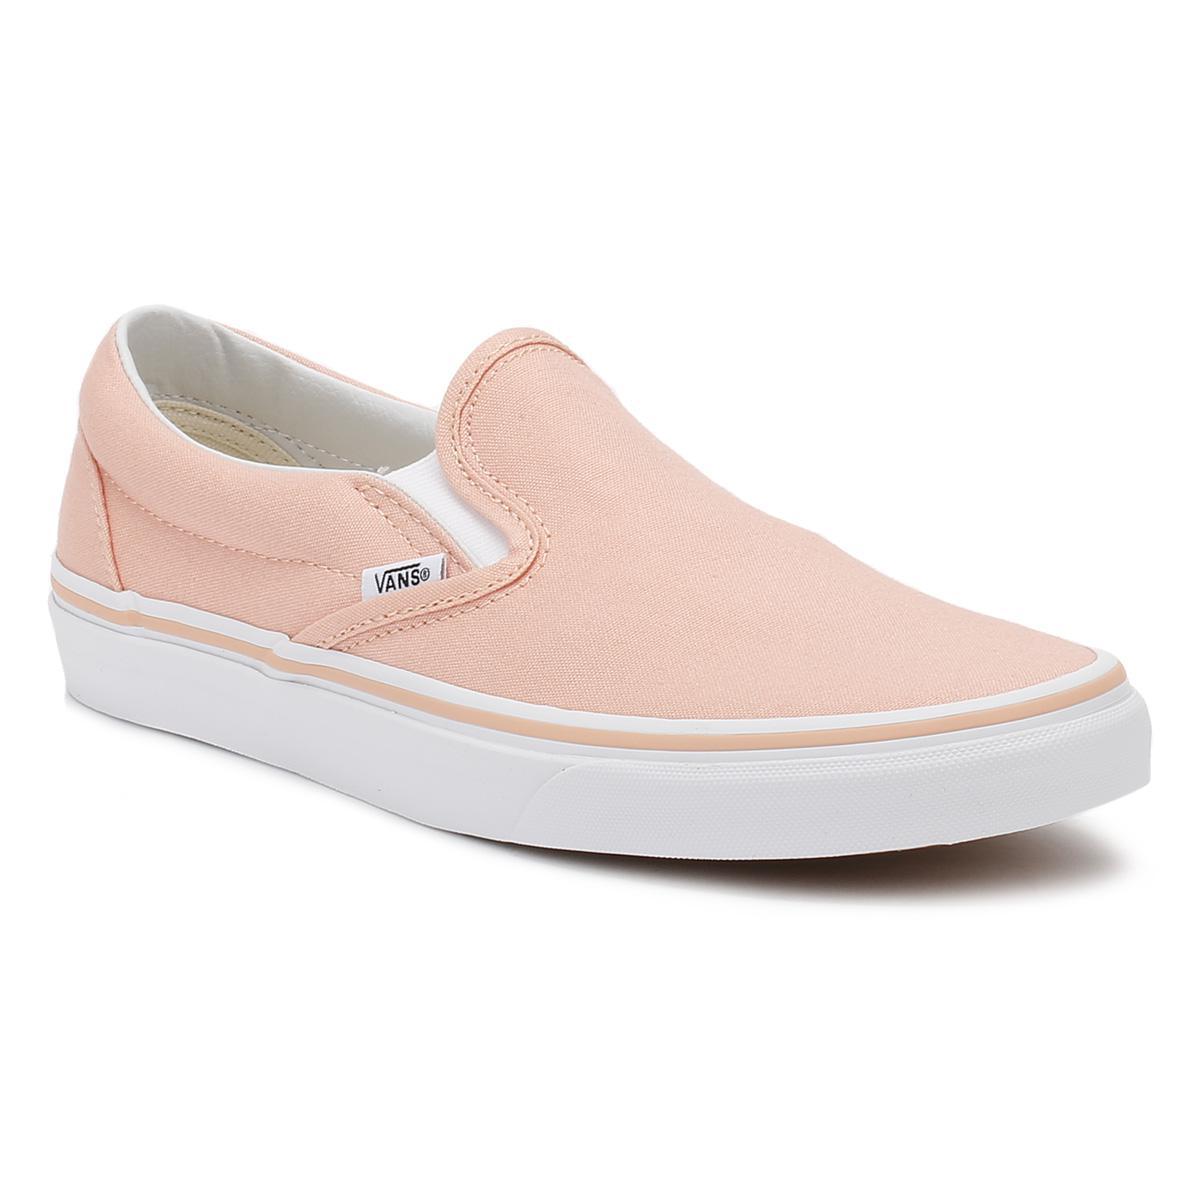 4577f26819bb Lyst - Vans Classic Slip-on Womens Tropical Peach True White Canvas ...